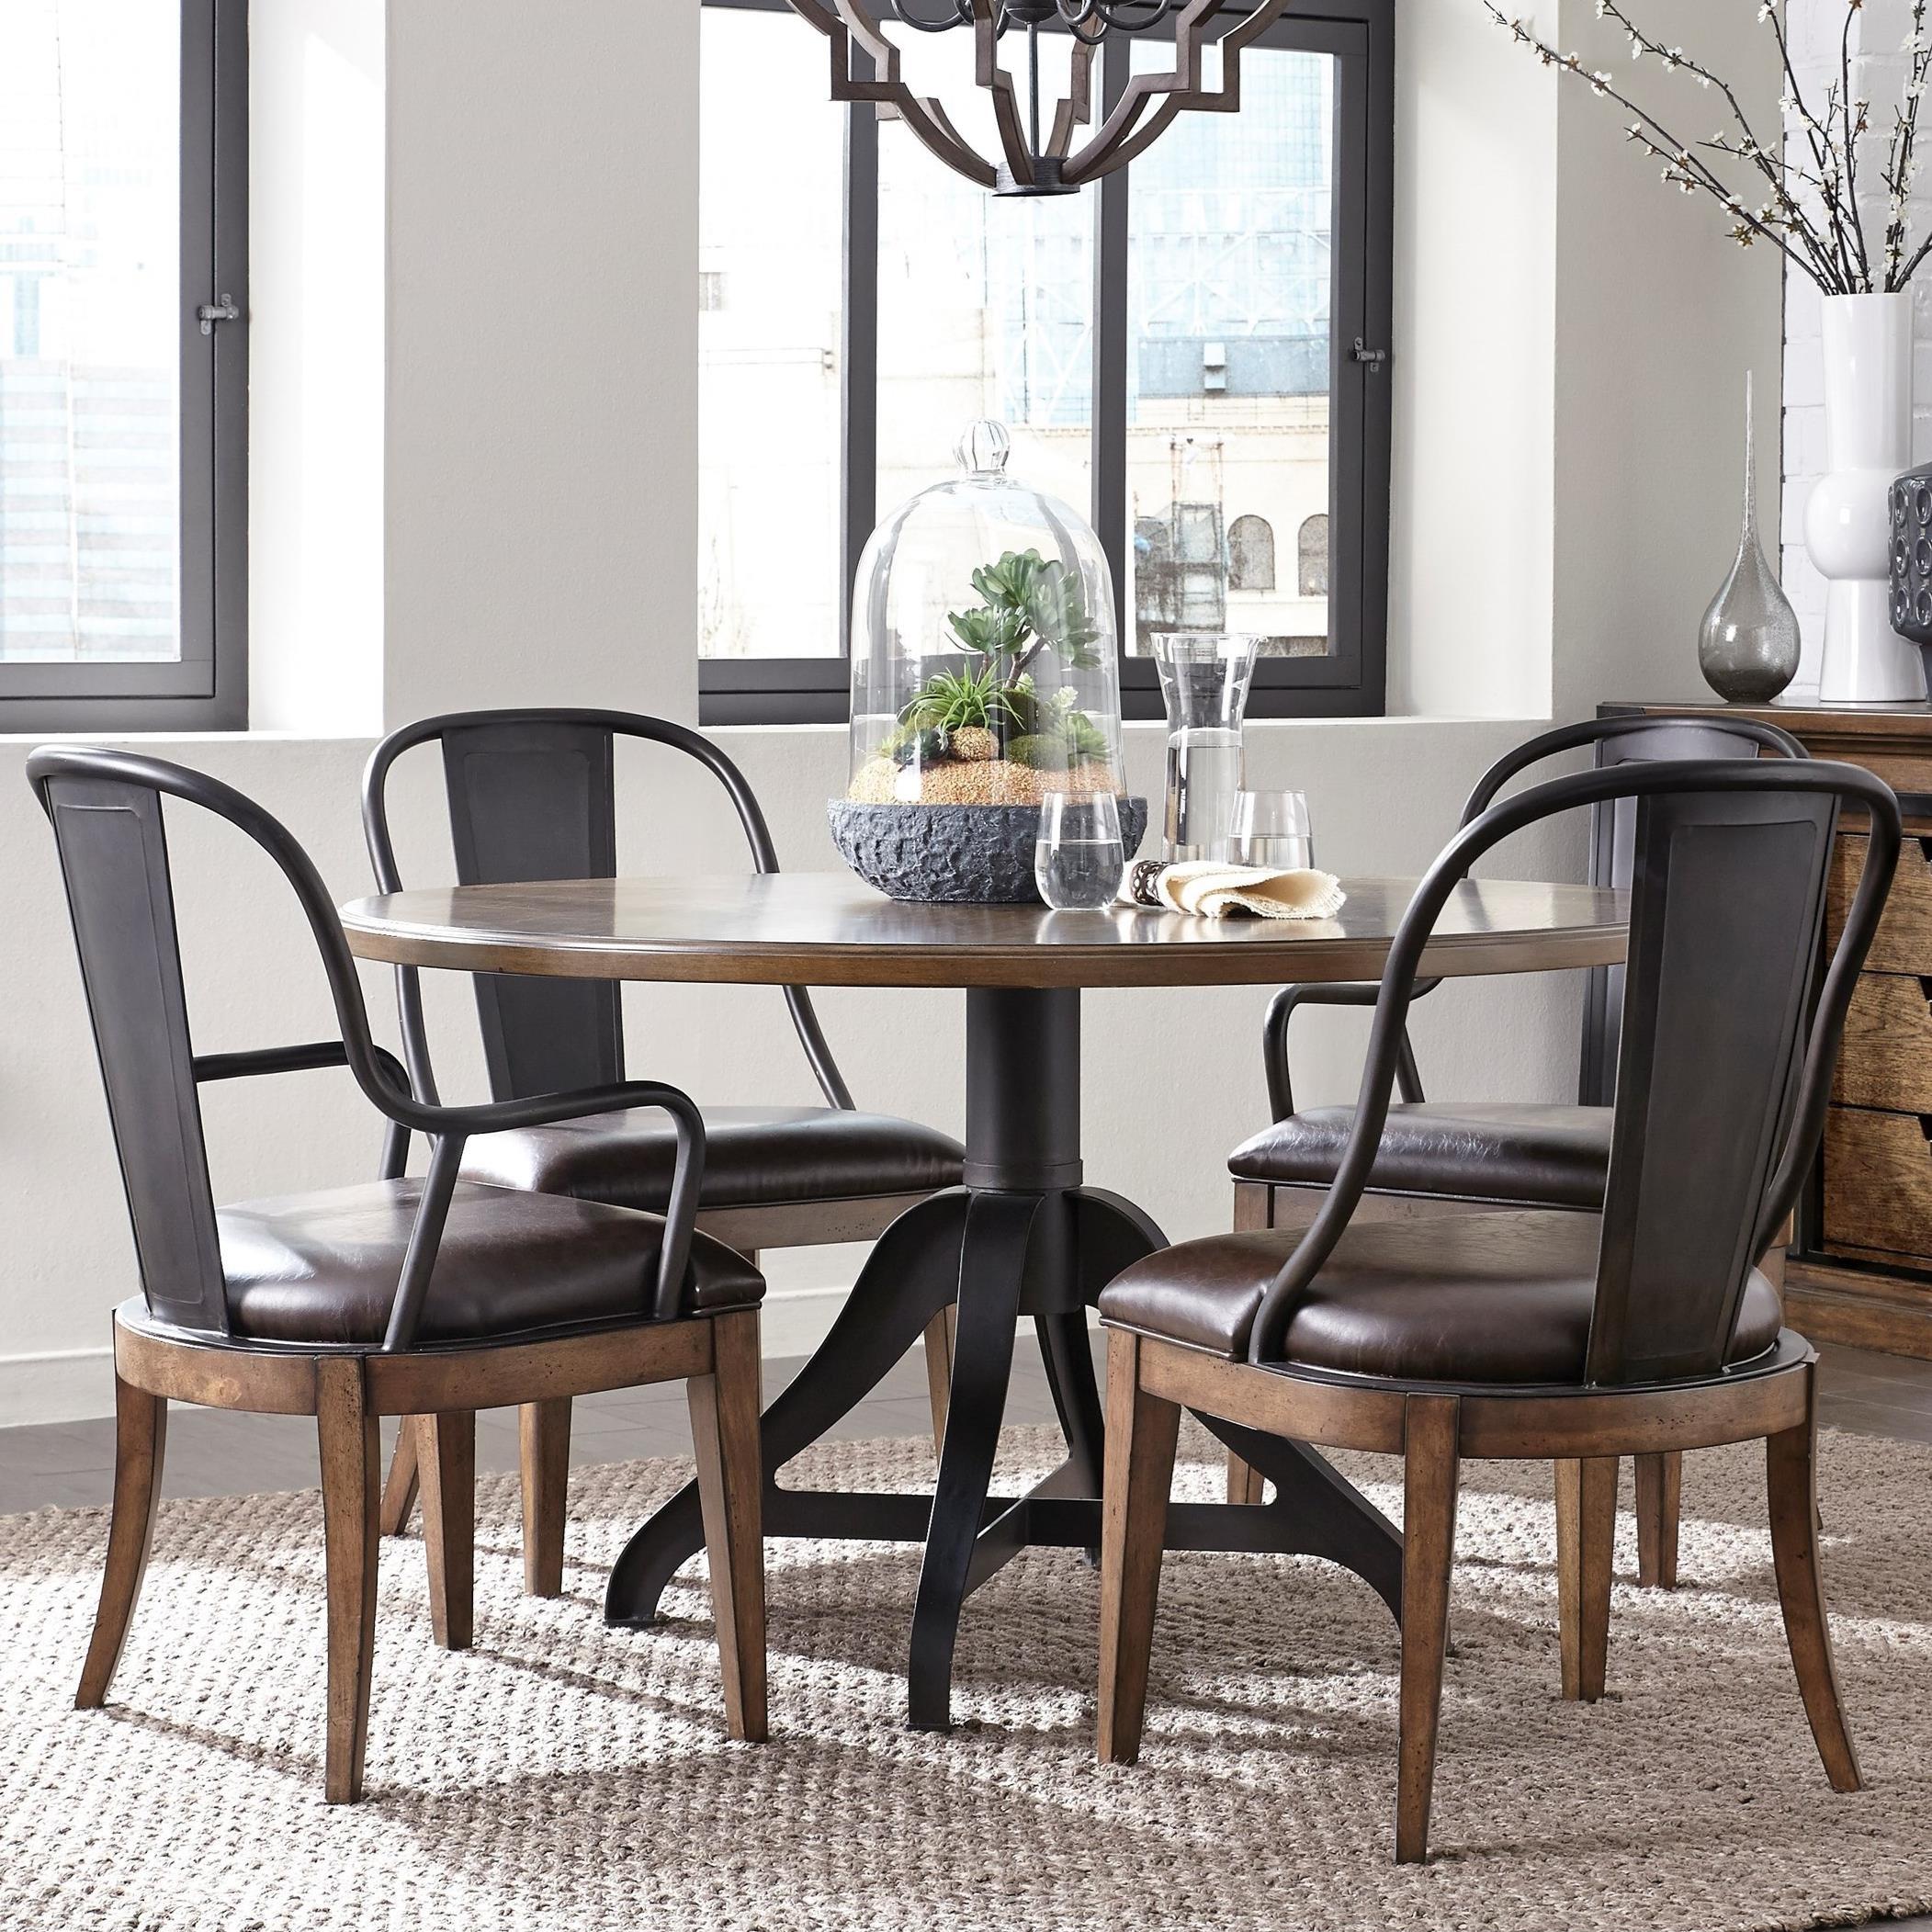 Pulaski Furniture Weston Loft 5 Piece Round Table And Metal Back Chair Set